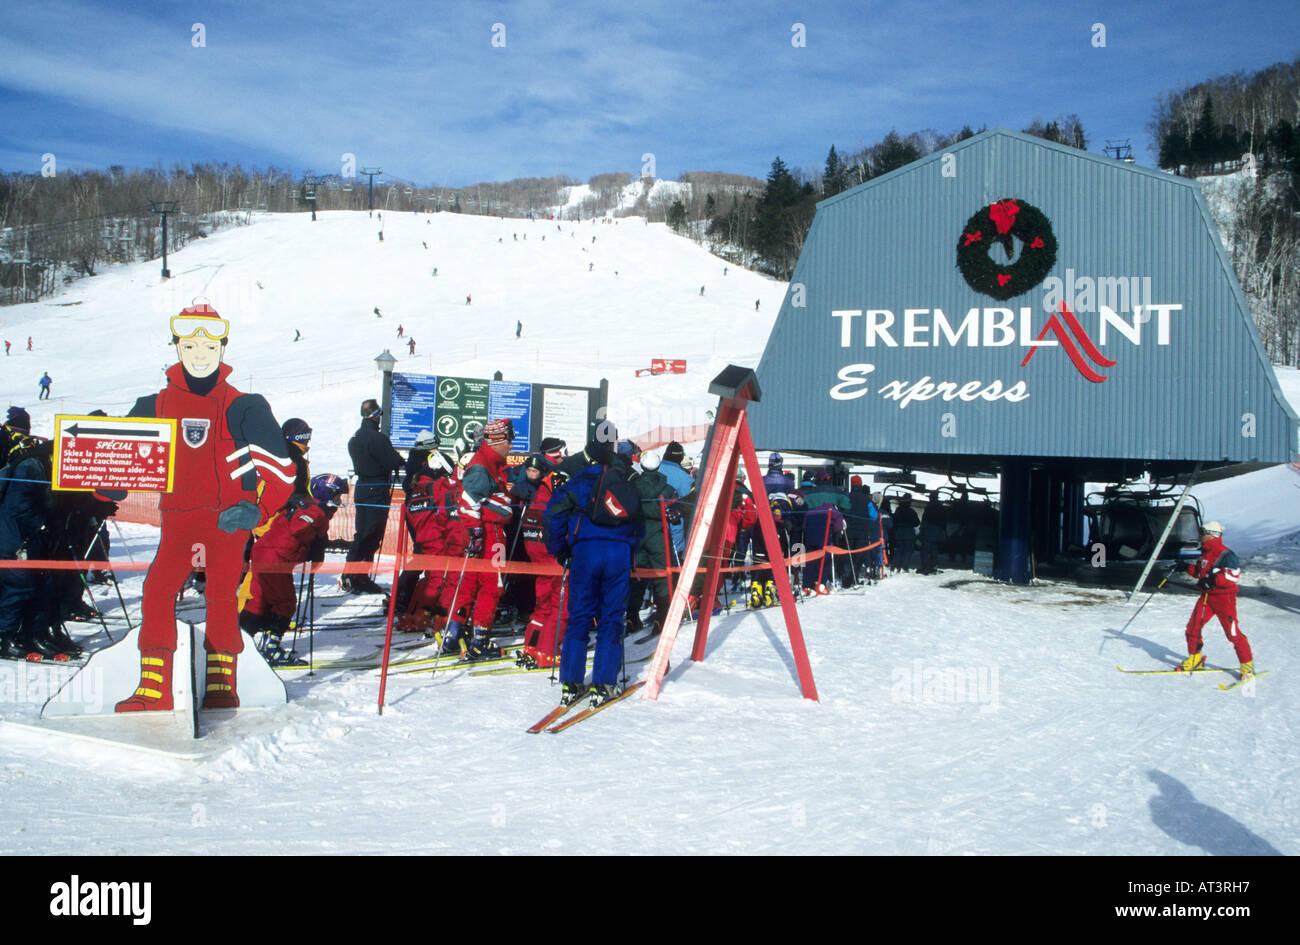 major ski lift at the mont tremblant ski resort in quebec,canada